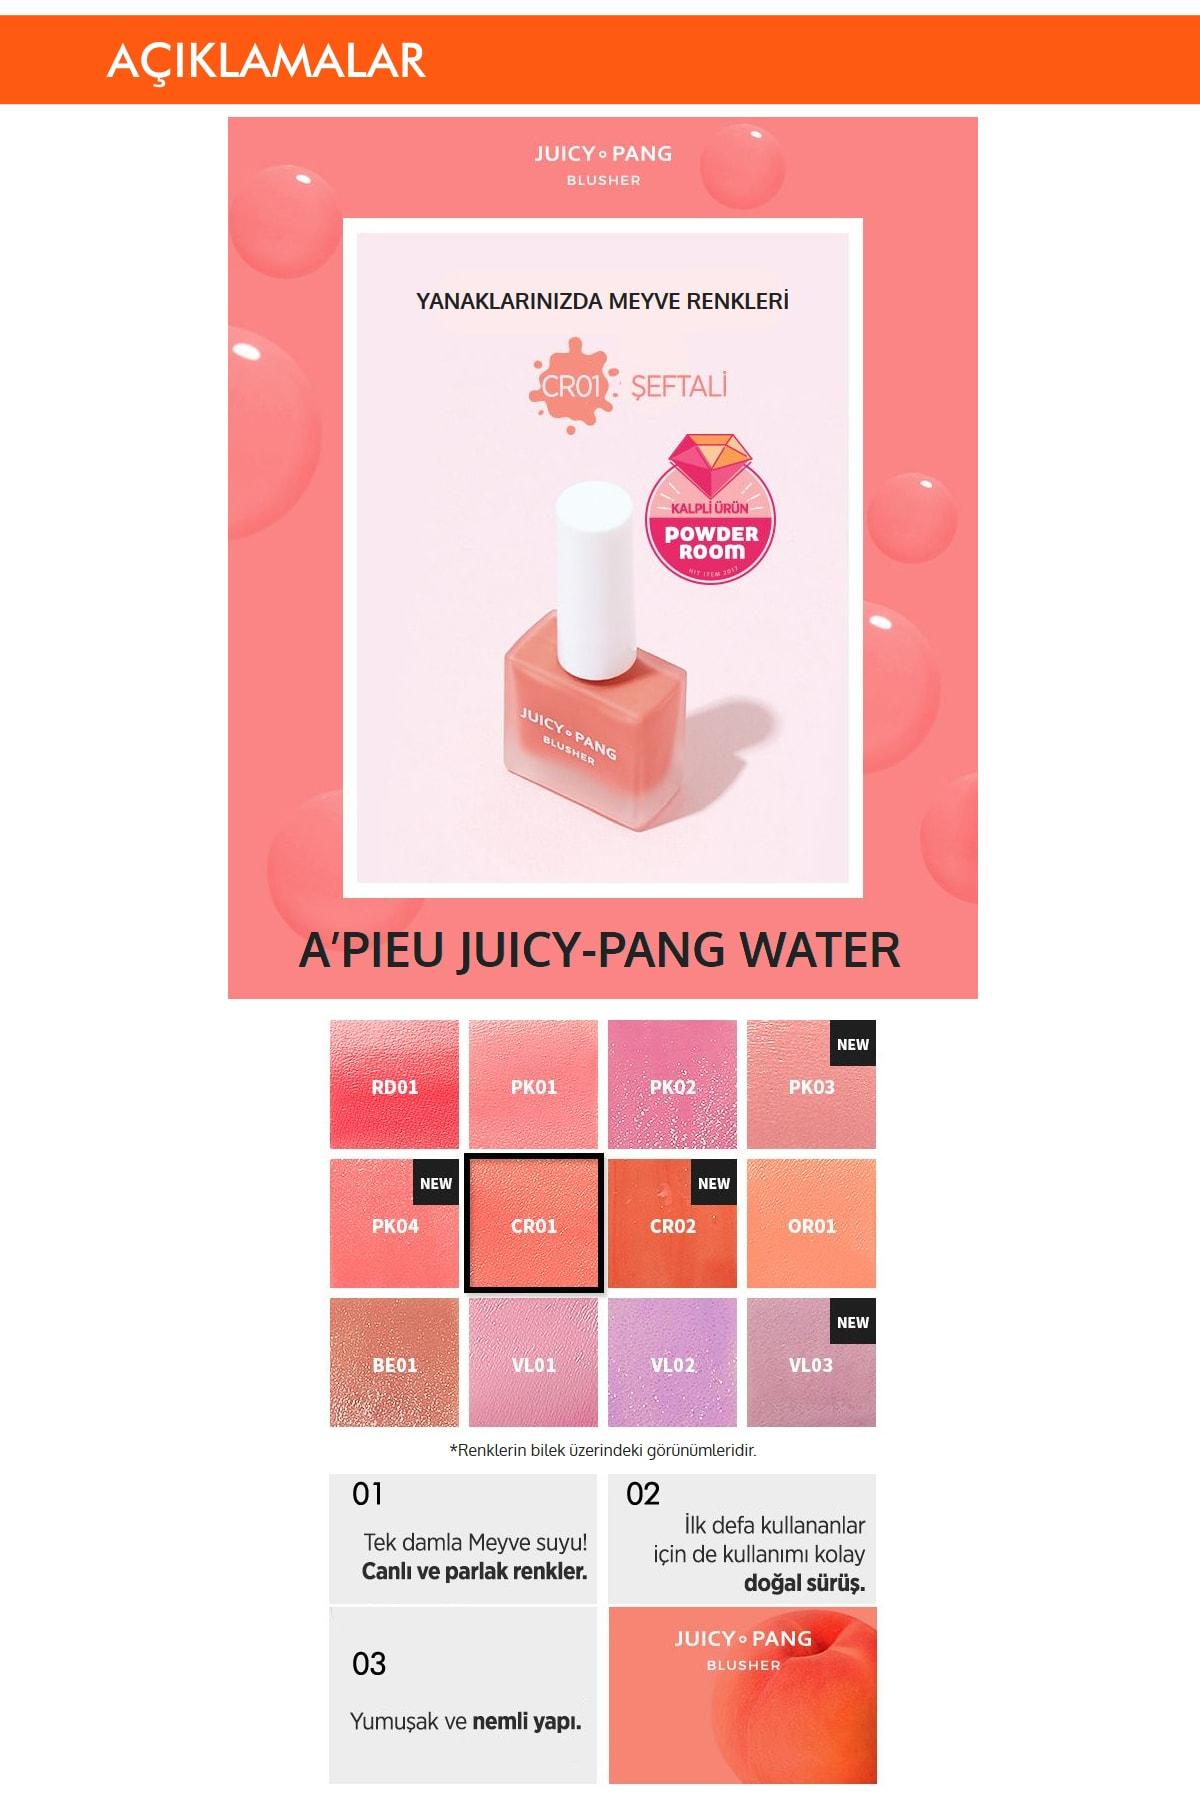 Missha Doğal Görünüm Sunan Nemlendirici Likit Allık 9g. APIEU Juicy-Pang Water Blusher (CR01) 1